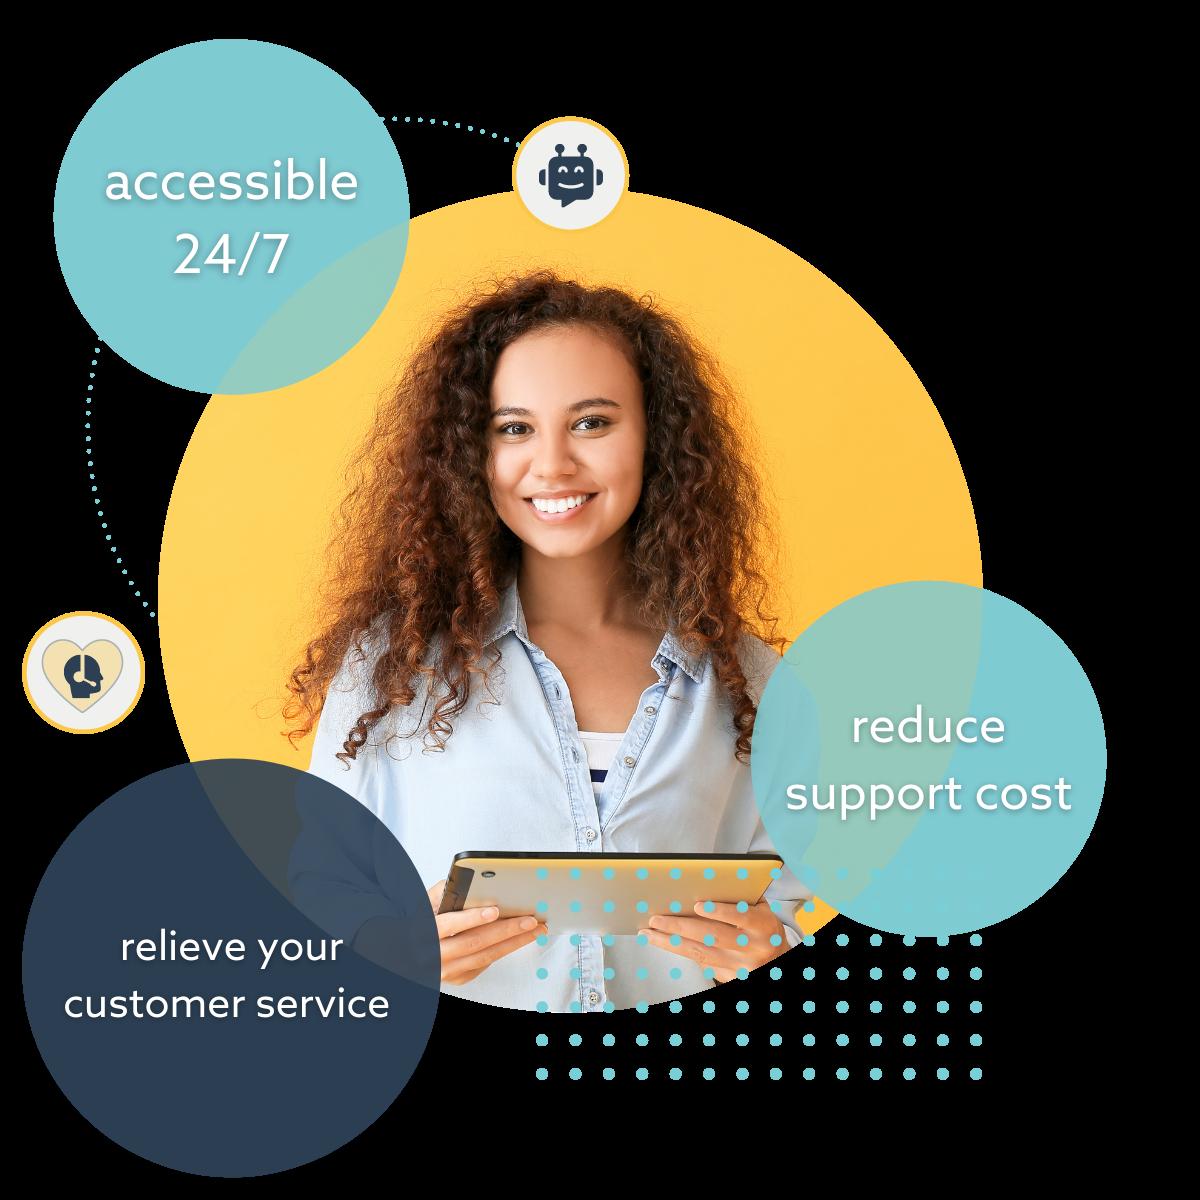 Improving customer service quality at Sunrise